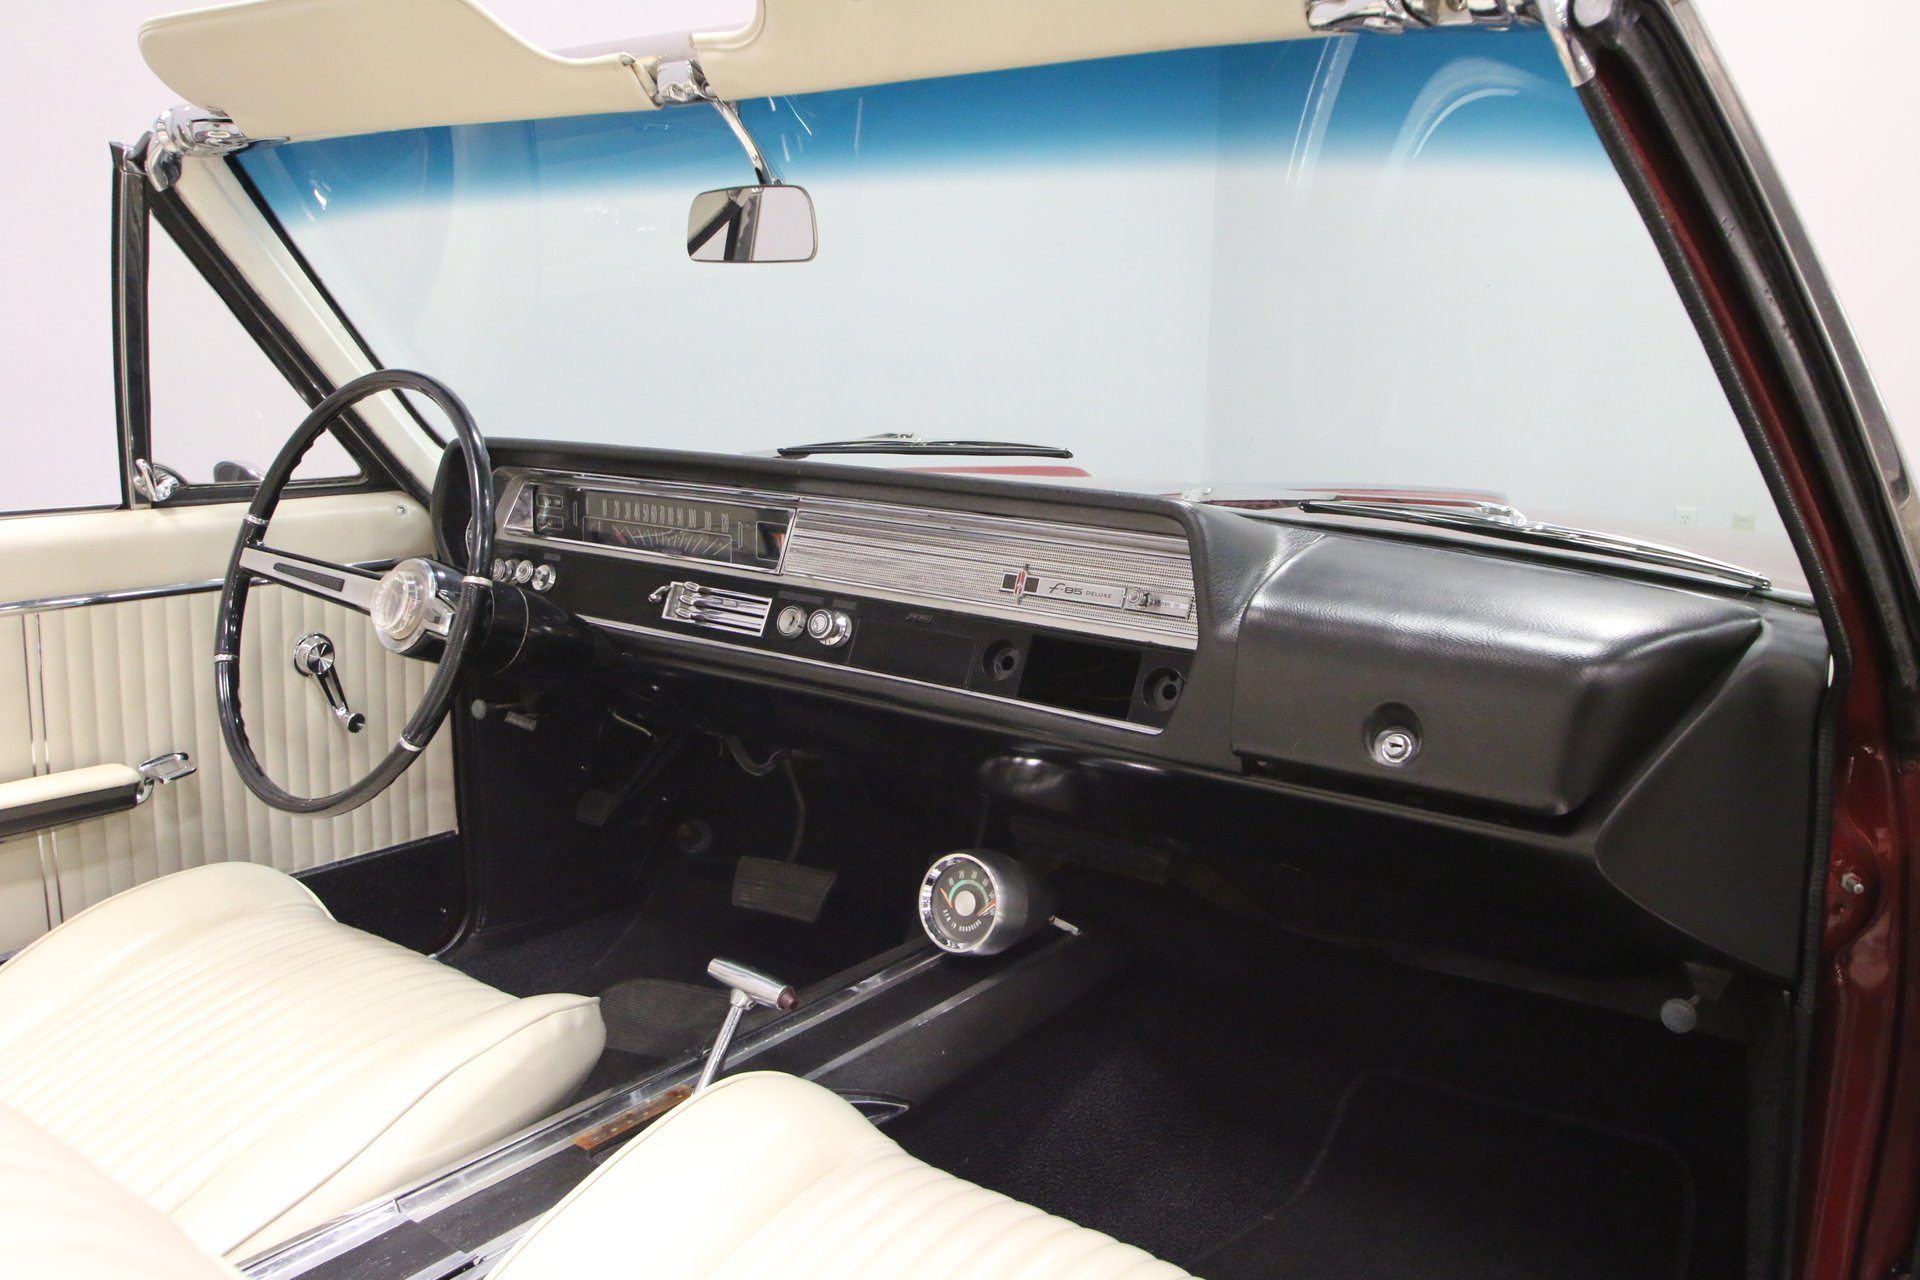 1964 Oldsmobile Cutlass | Streetside Classics - The Nation's